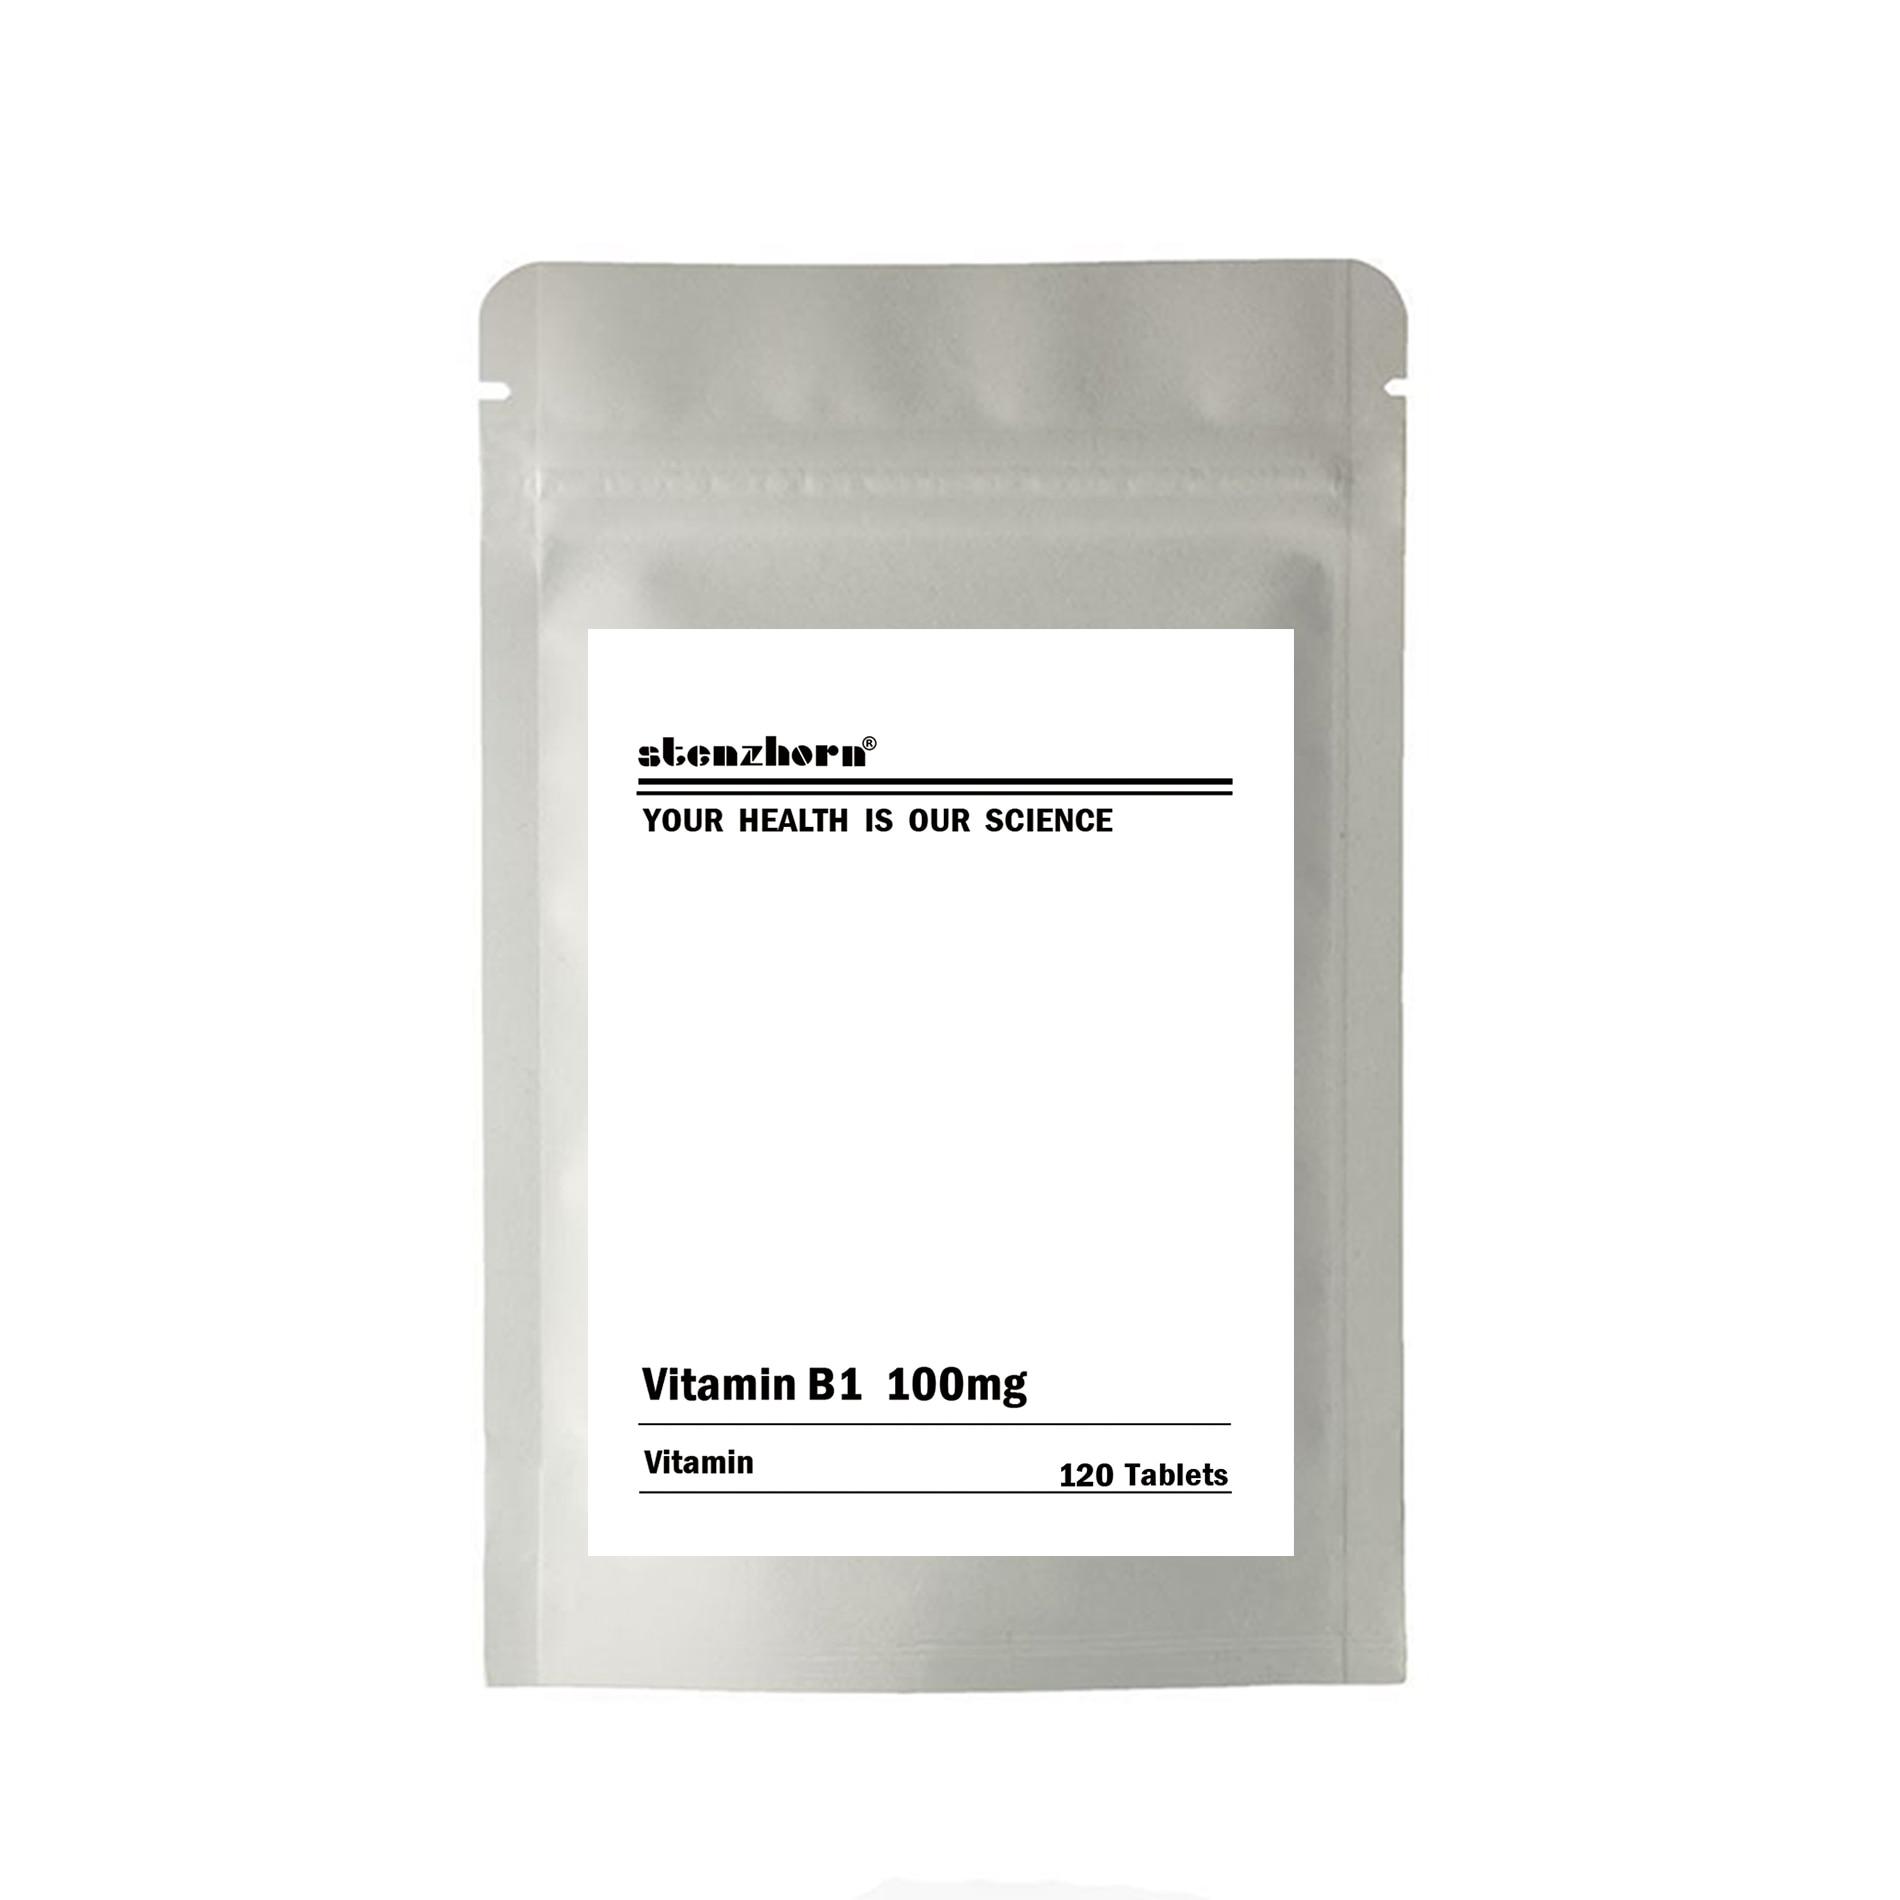 Multifuncional suplemento vitamínico B1 100 mg 120 unidades 100 mg de garantia de Qualidade